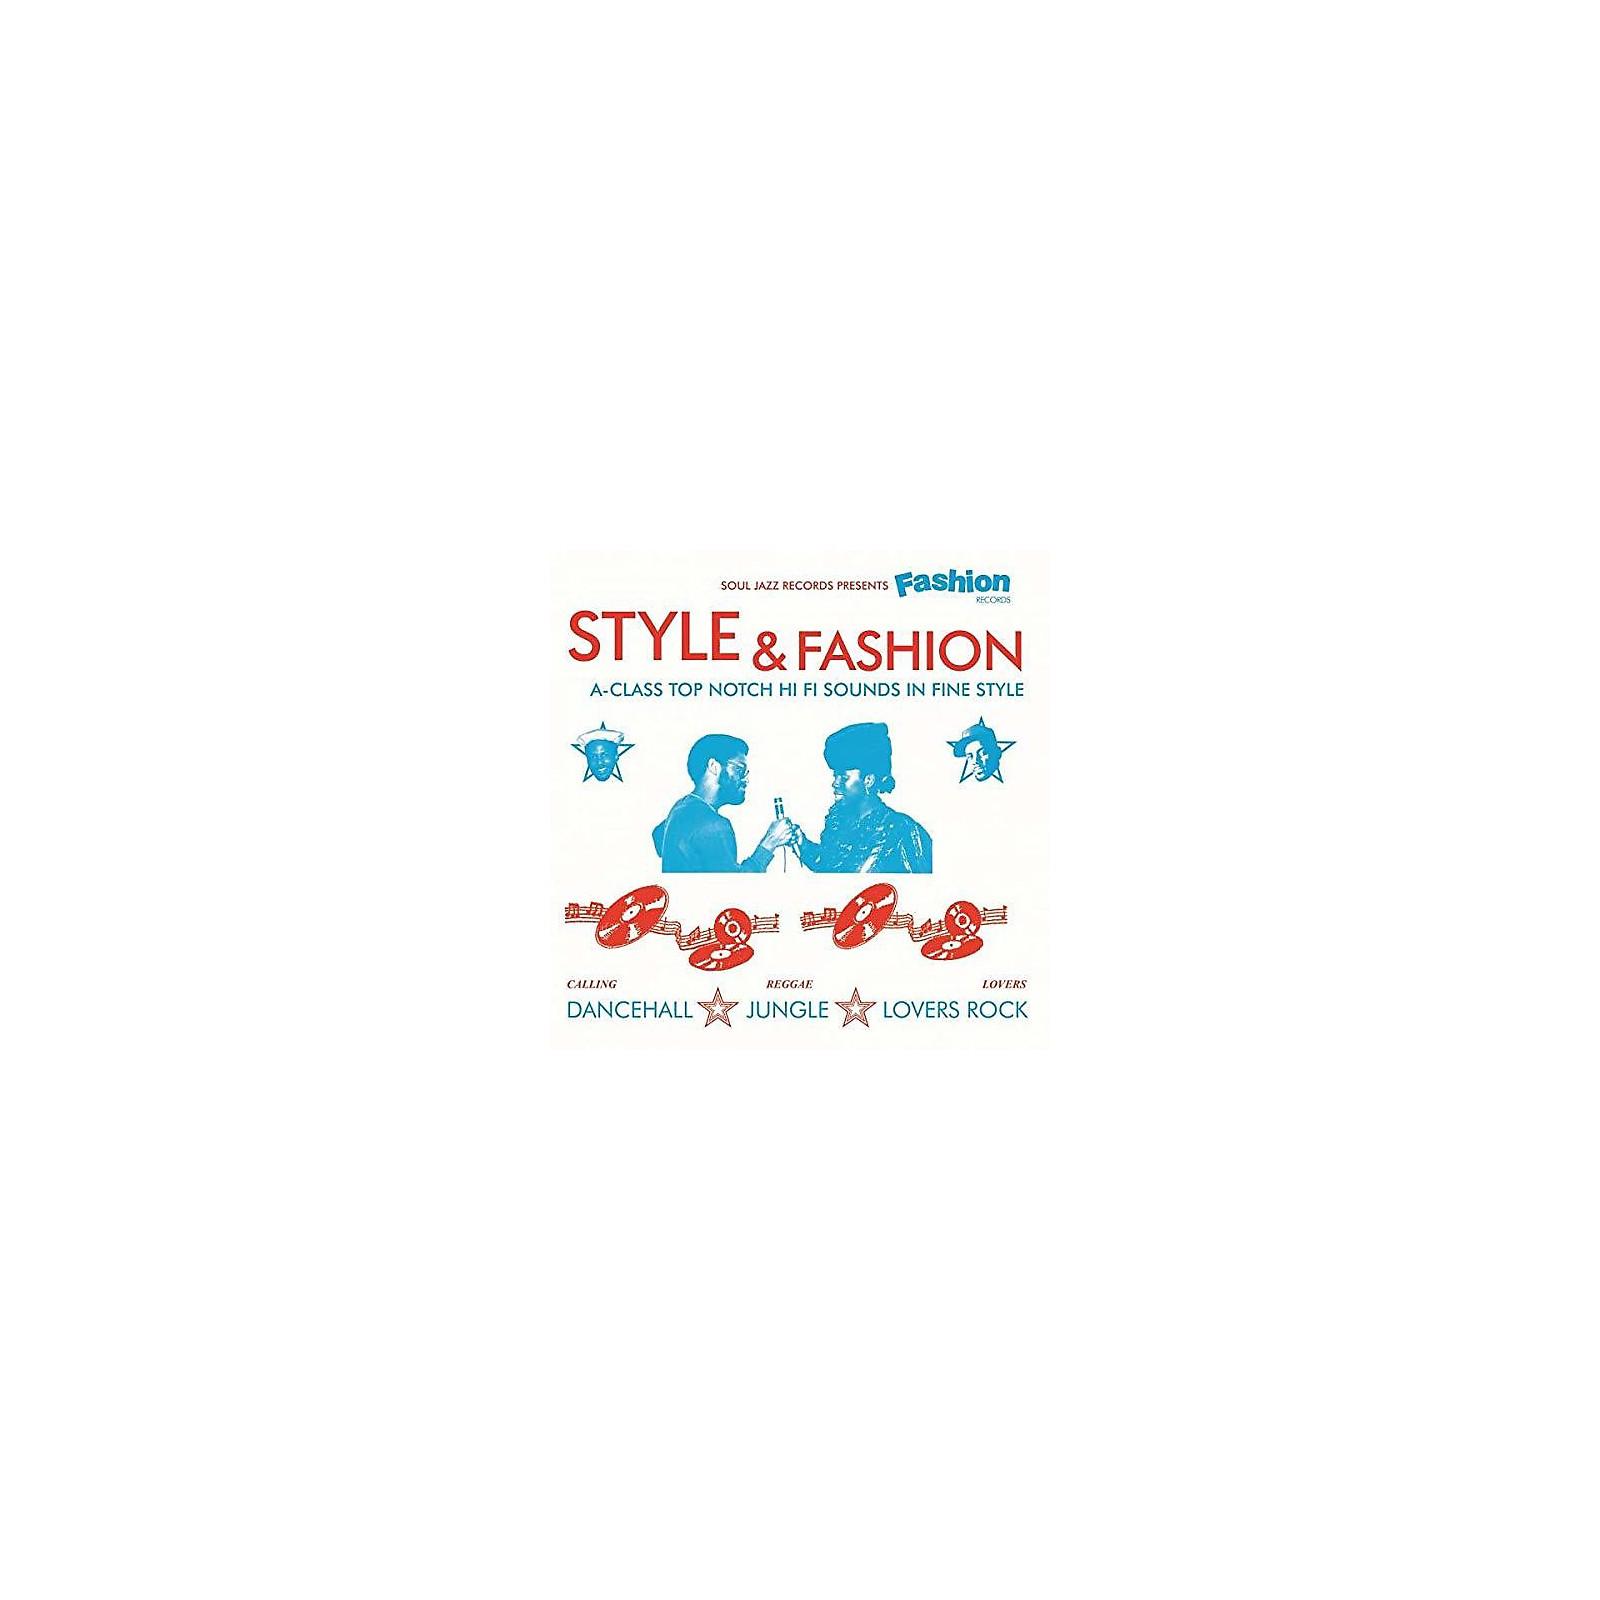 Alliance Soul Jazz Records Presents Fashion Records: Style & Fashion